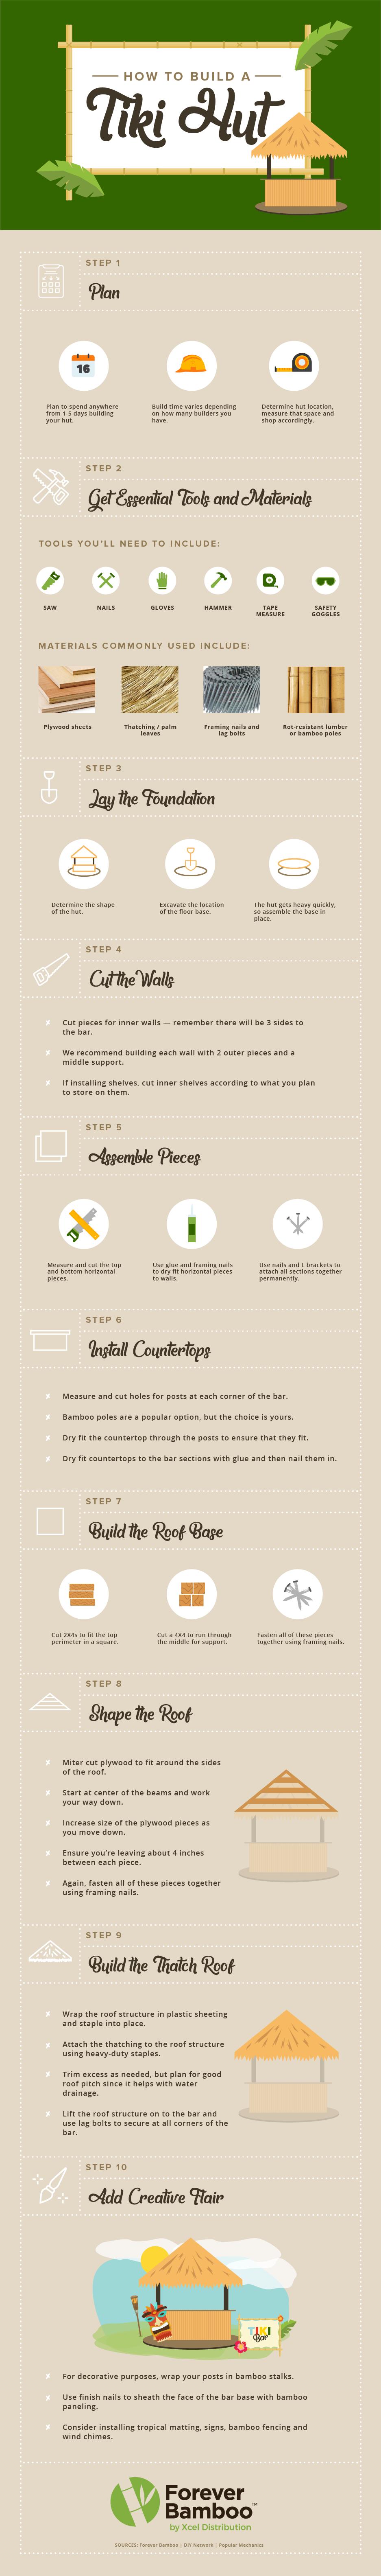 Steps for Building a Tiki Hut DIY